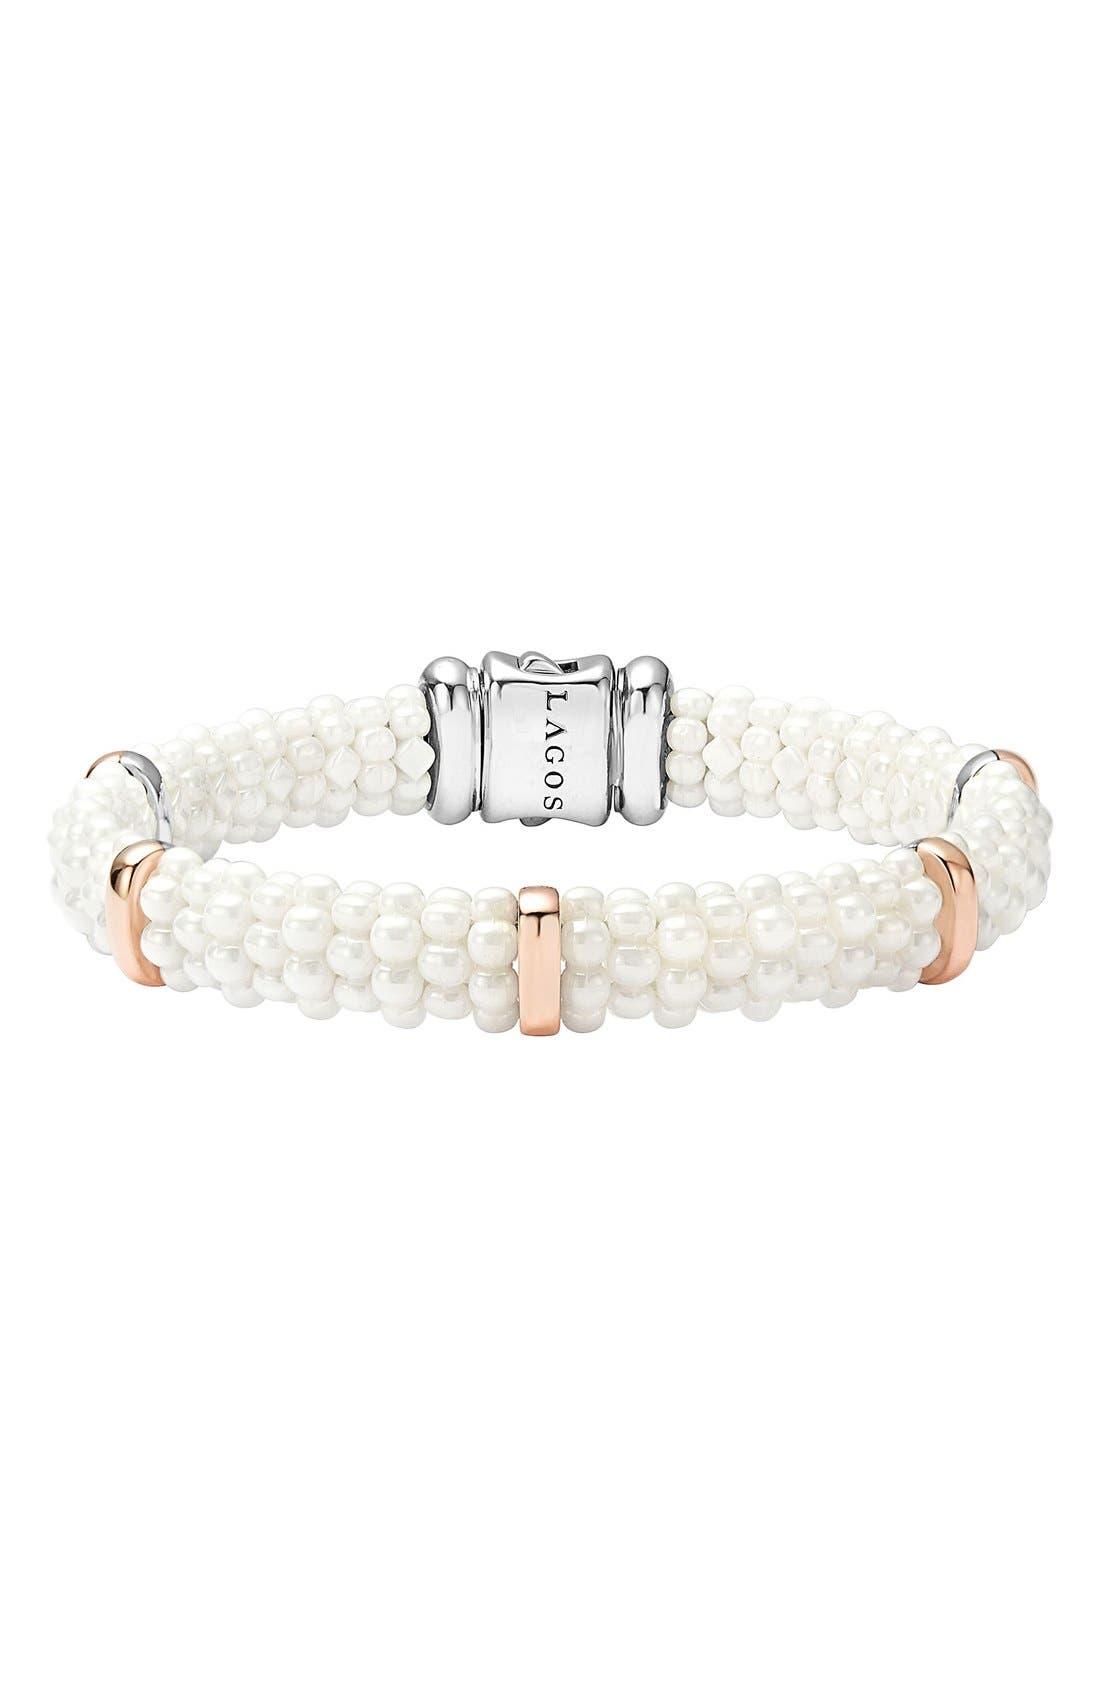 'White Caviar' Five Station Bracelet,                             Main thumbnail 1, color,                             White Caviar